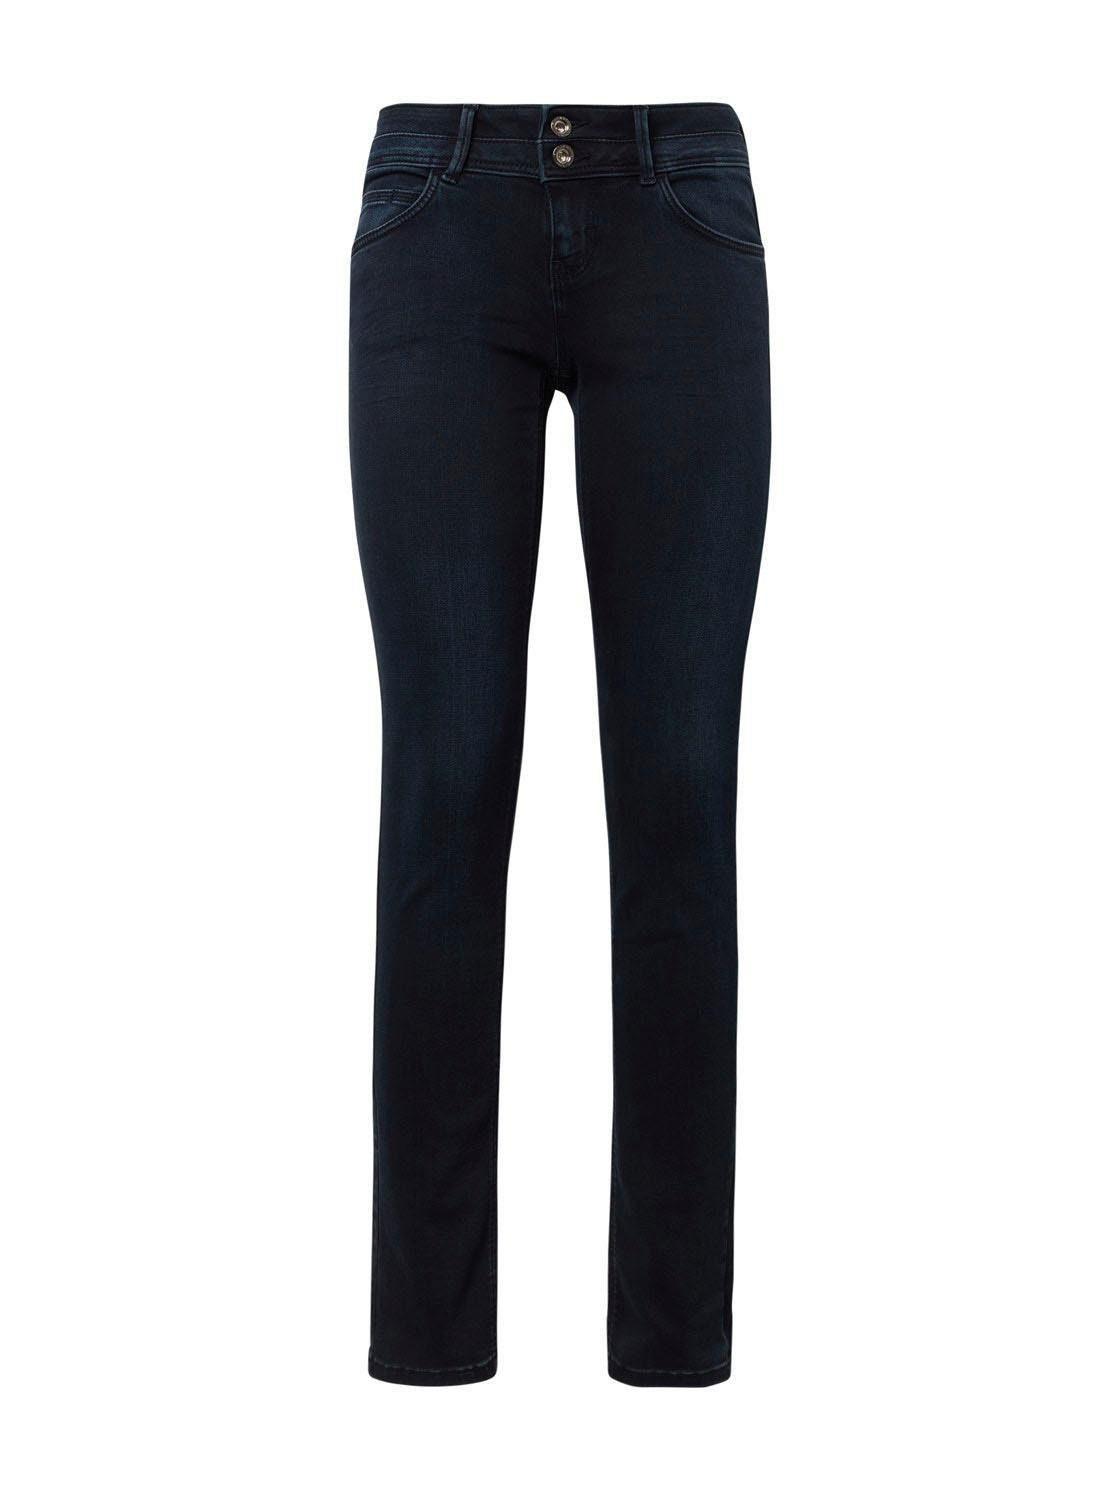 TOM TAILOR Slim fit Jeans »Carry Slim« in klassischer 5 Pocket Form online kaufen | OTTO